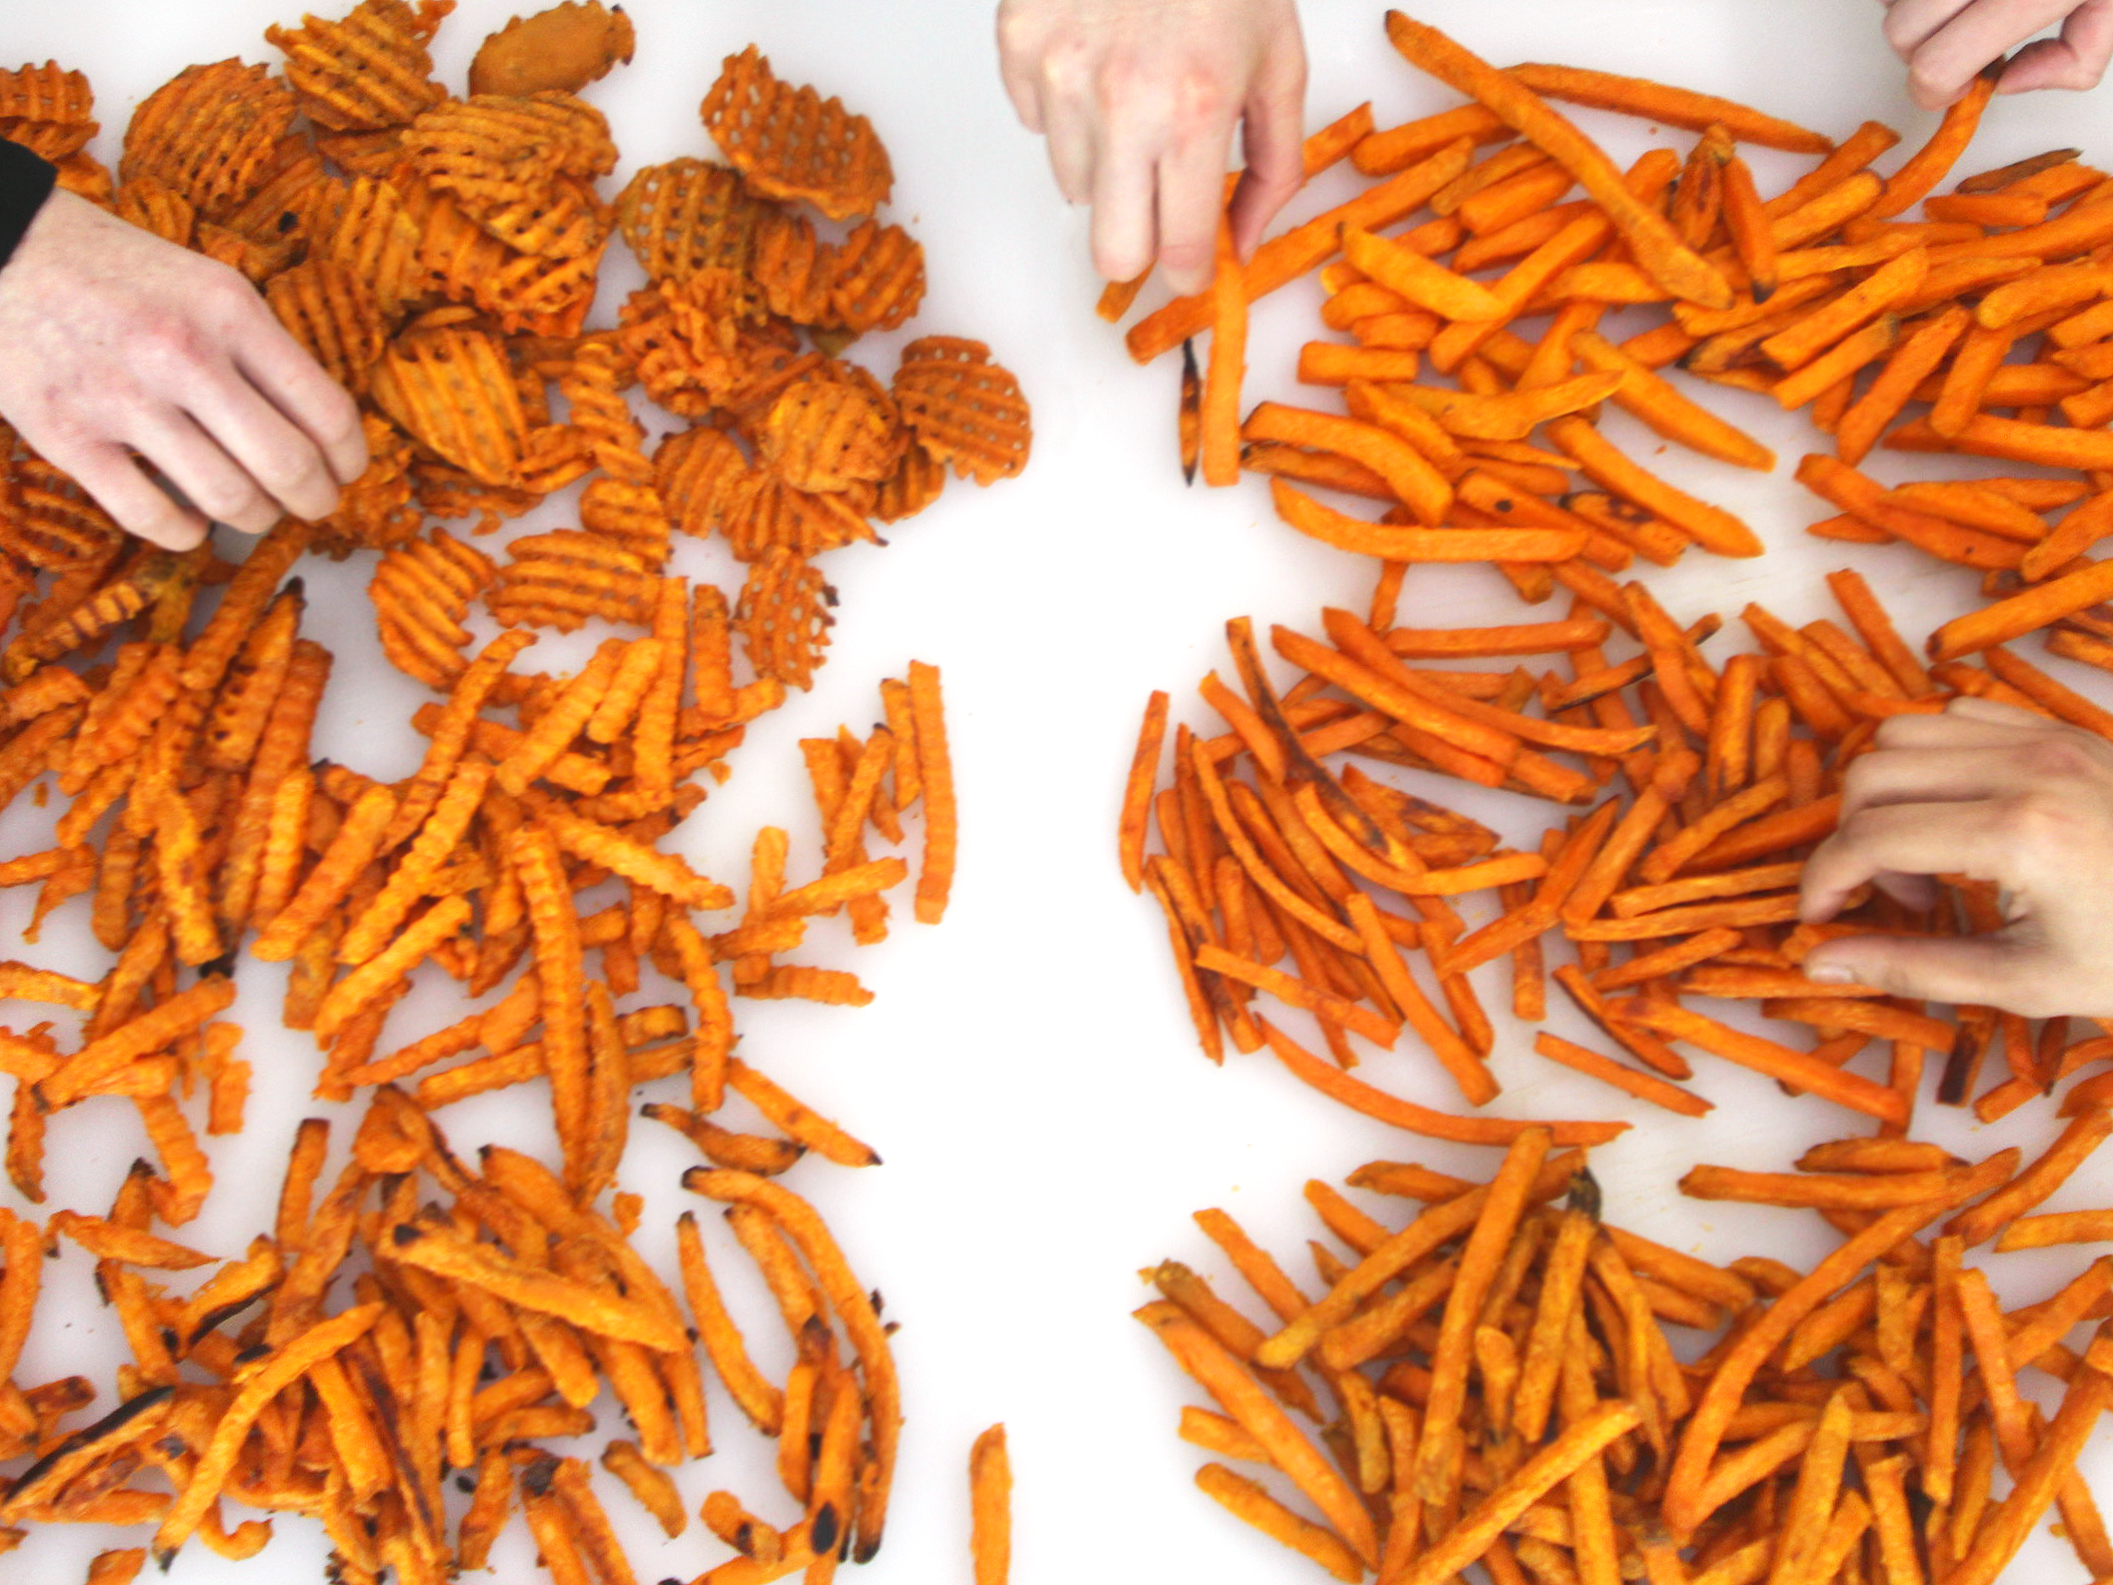 sweet-potato-fry-taste-test